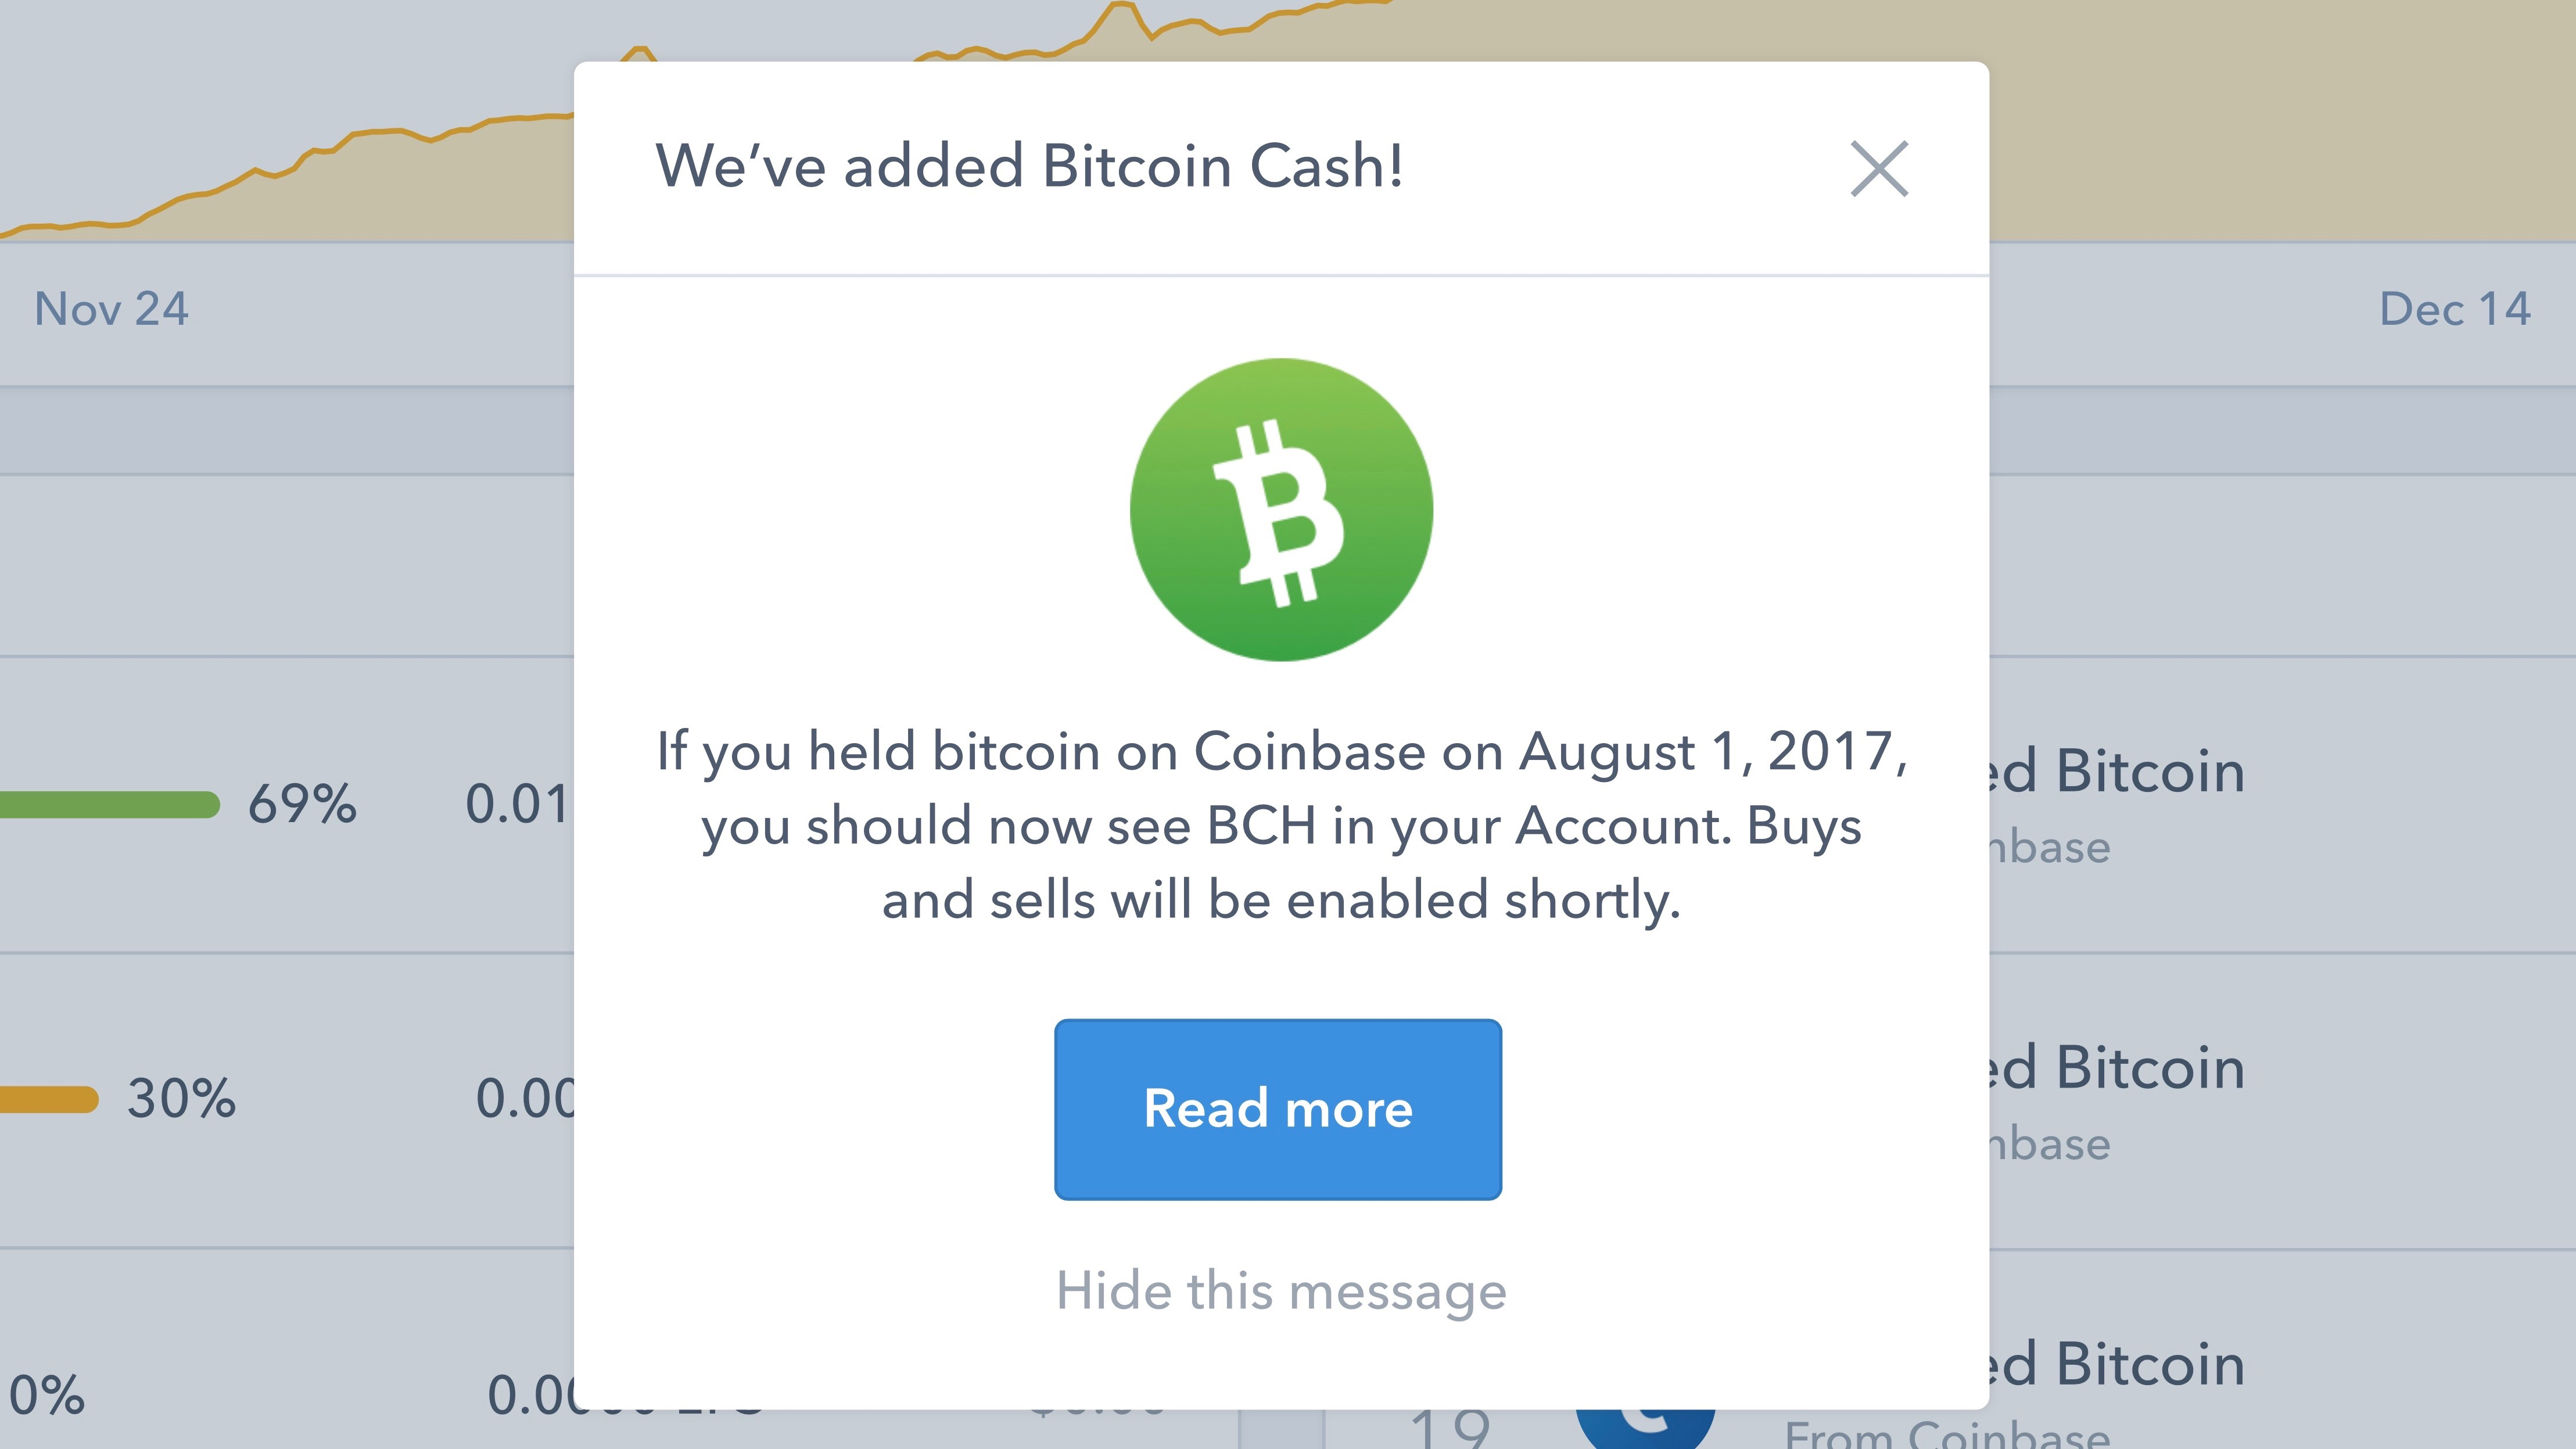 bitcoin miliardario hack android bots sui mercati btc